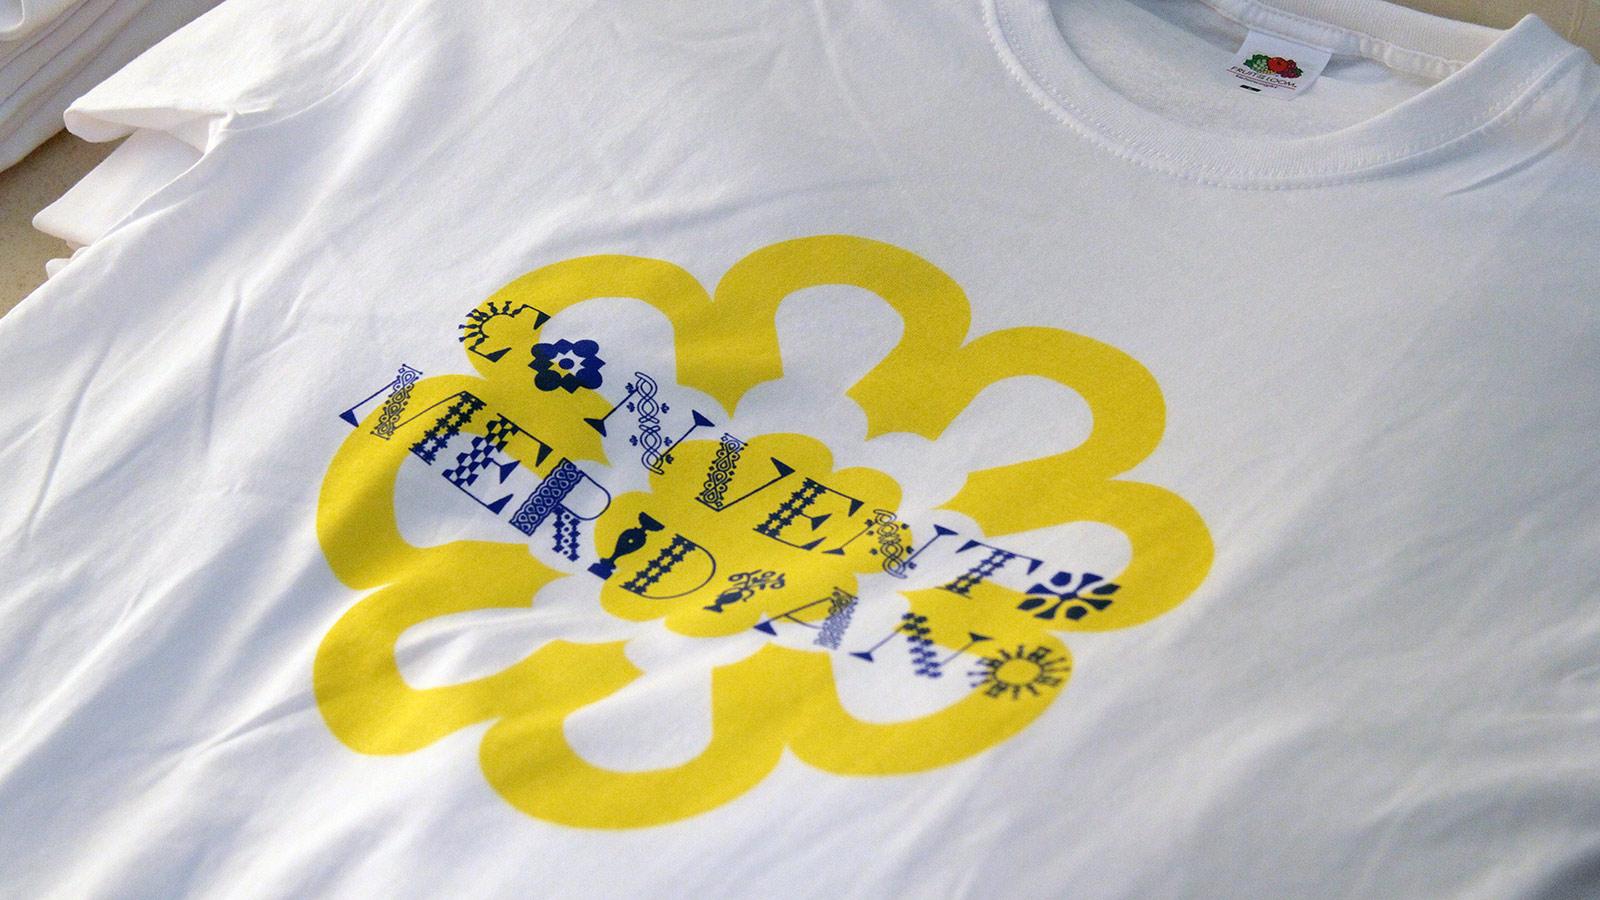 xyz2019 cerreto sannita tshirt do it yourself